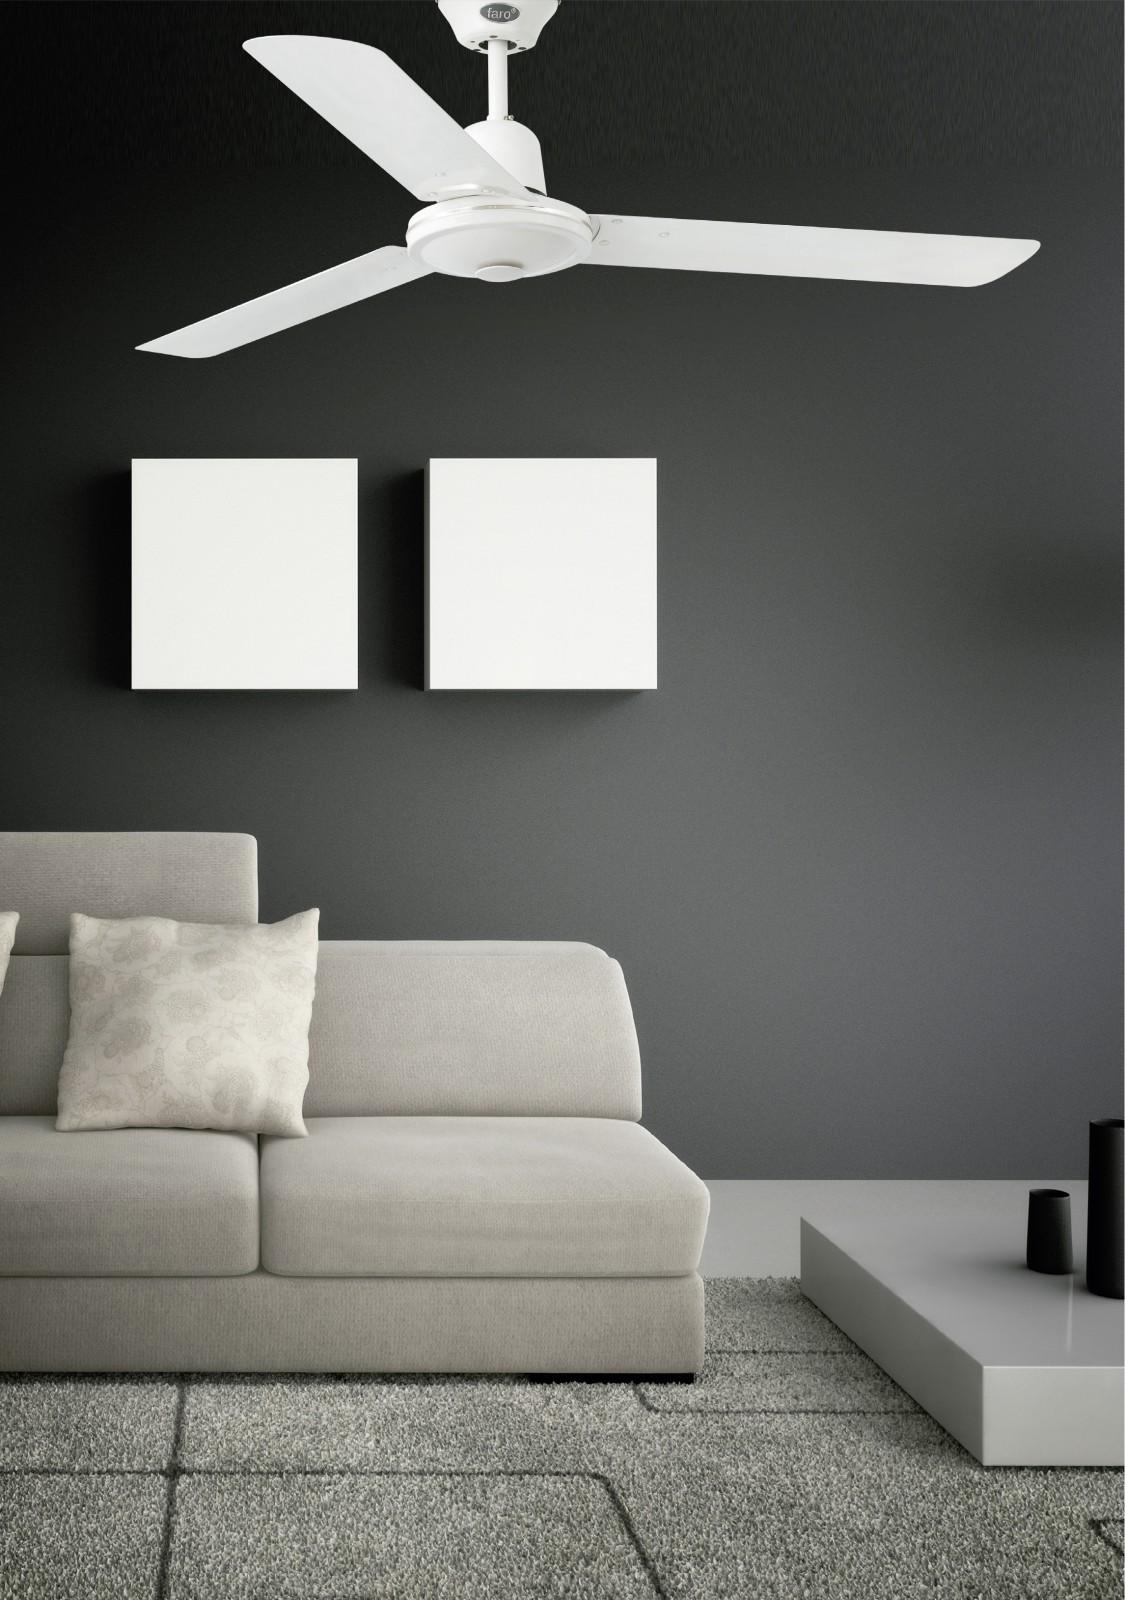 deckenventilator eco indus wei 120 cm mit wandschalter. Black Bedroom Furniture Sets. Home Design Ideas